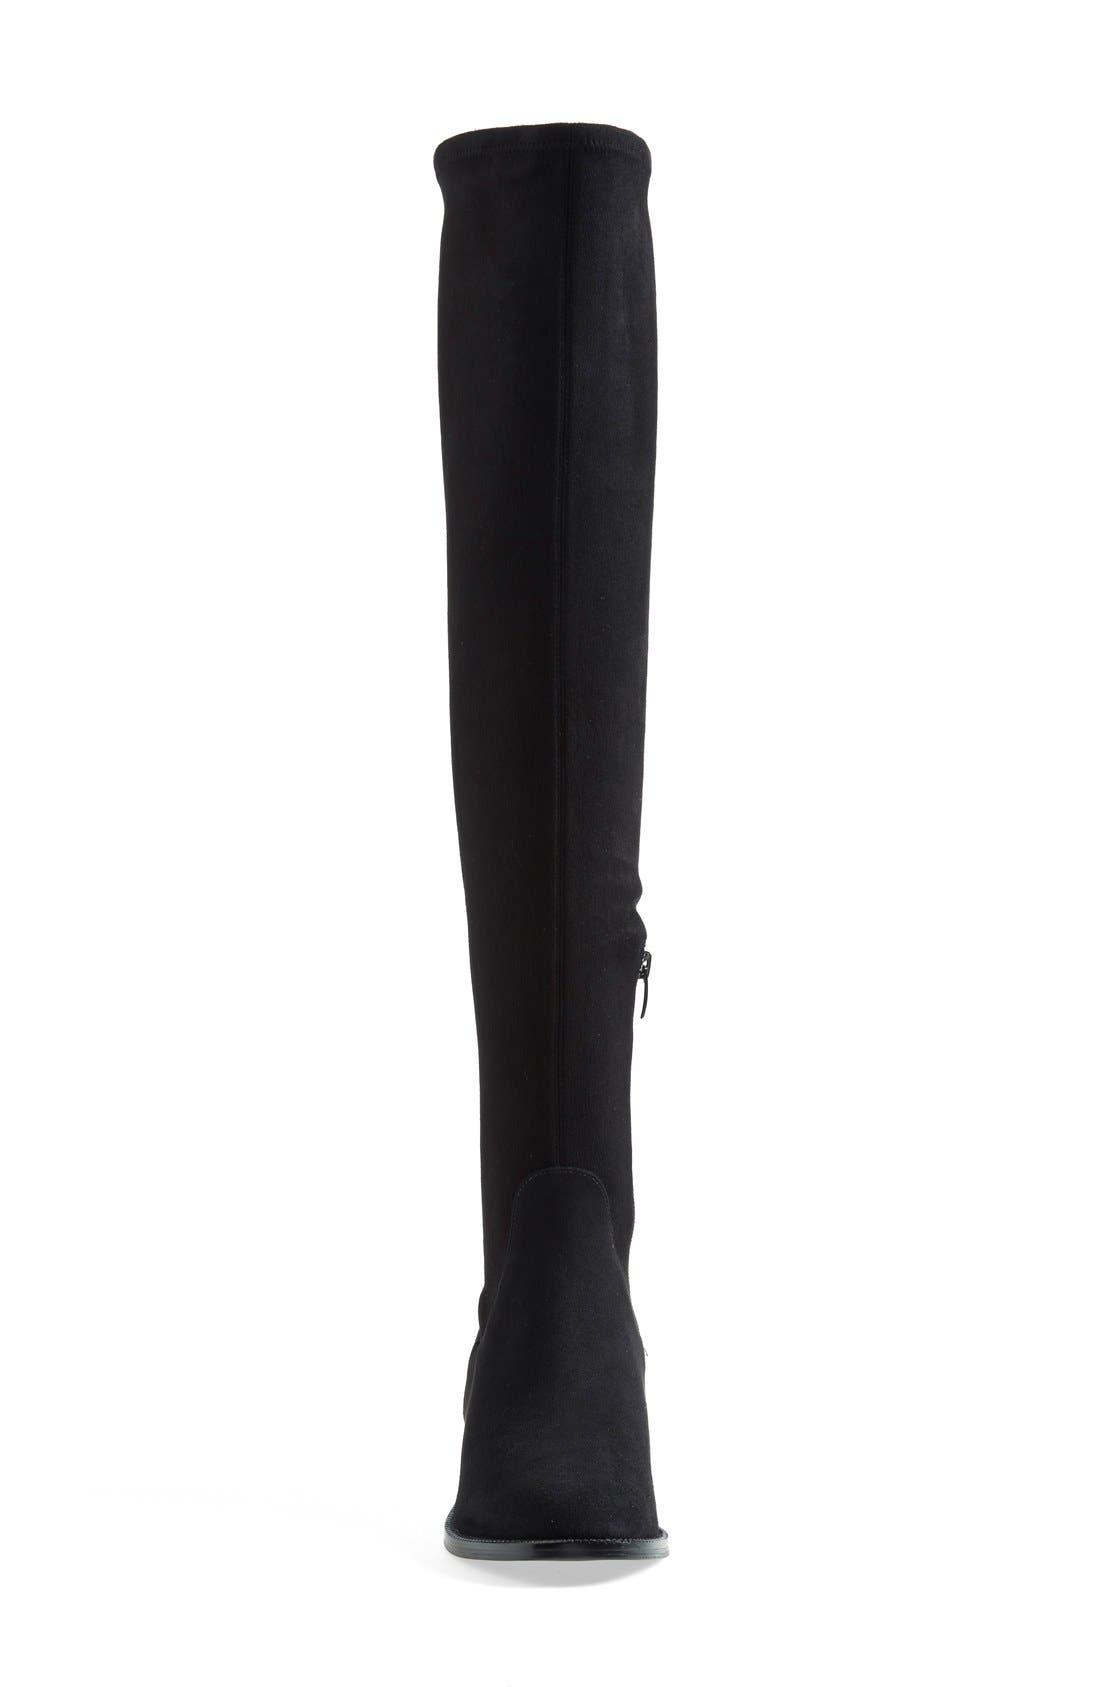 Alternate Image 3  - Via Spiga 'Boni' Over the Knee Boot (Women)